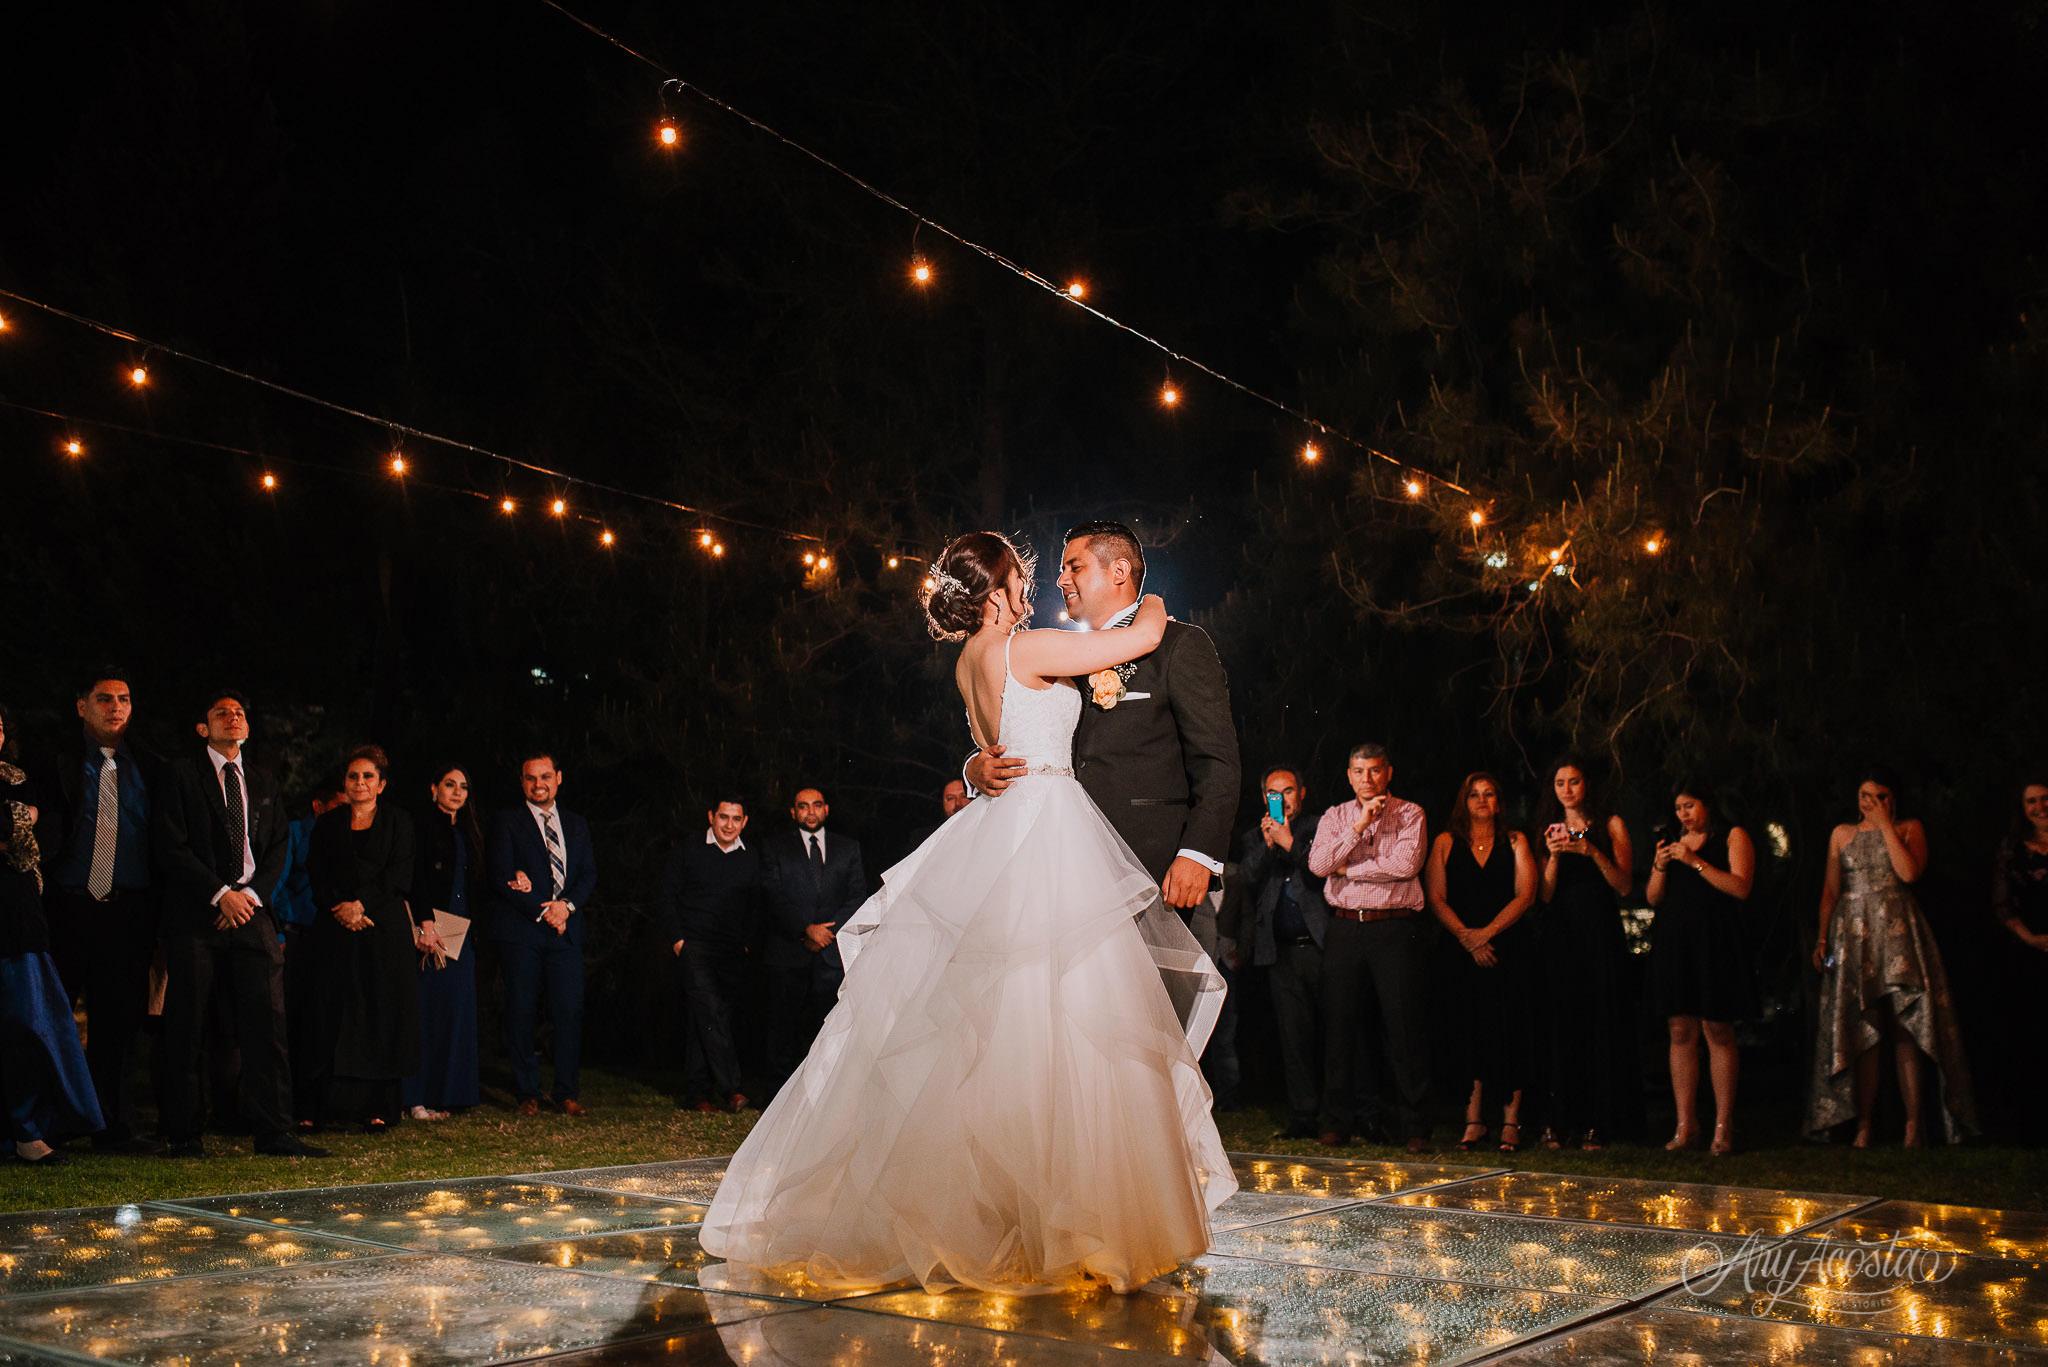 yazmin_ernesto_wedding-393.JPG